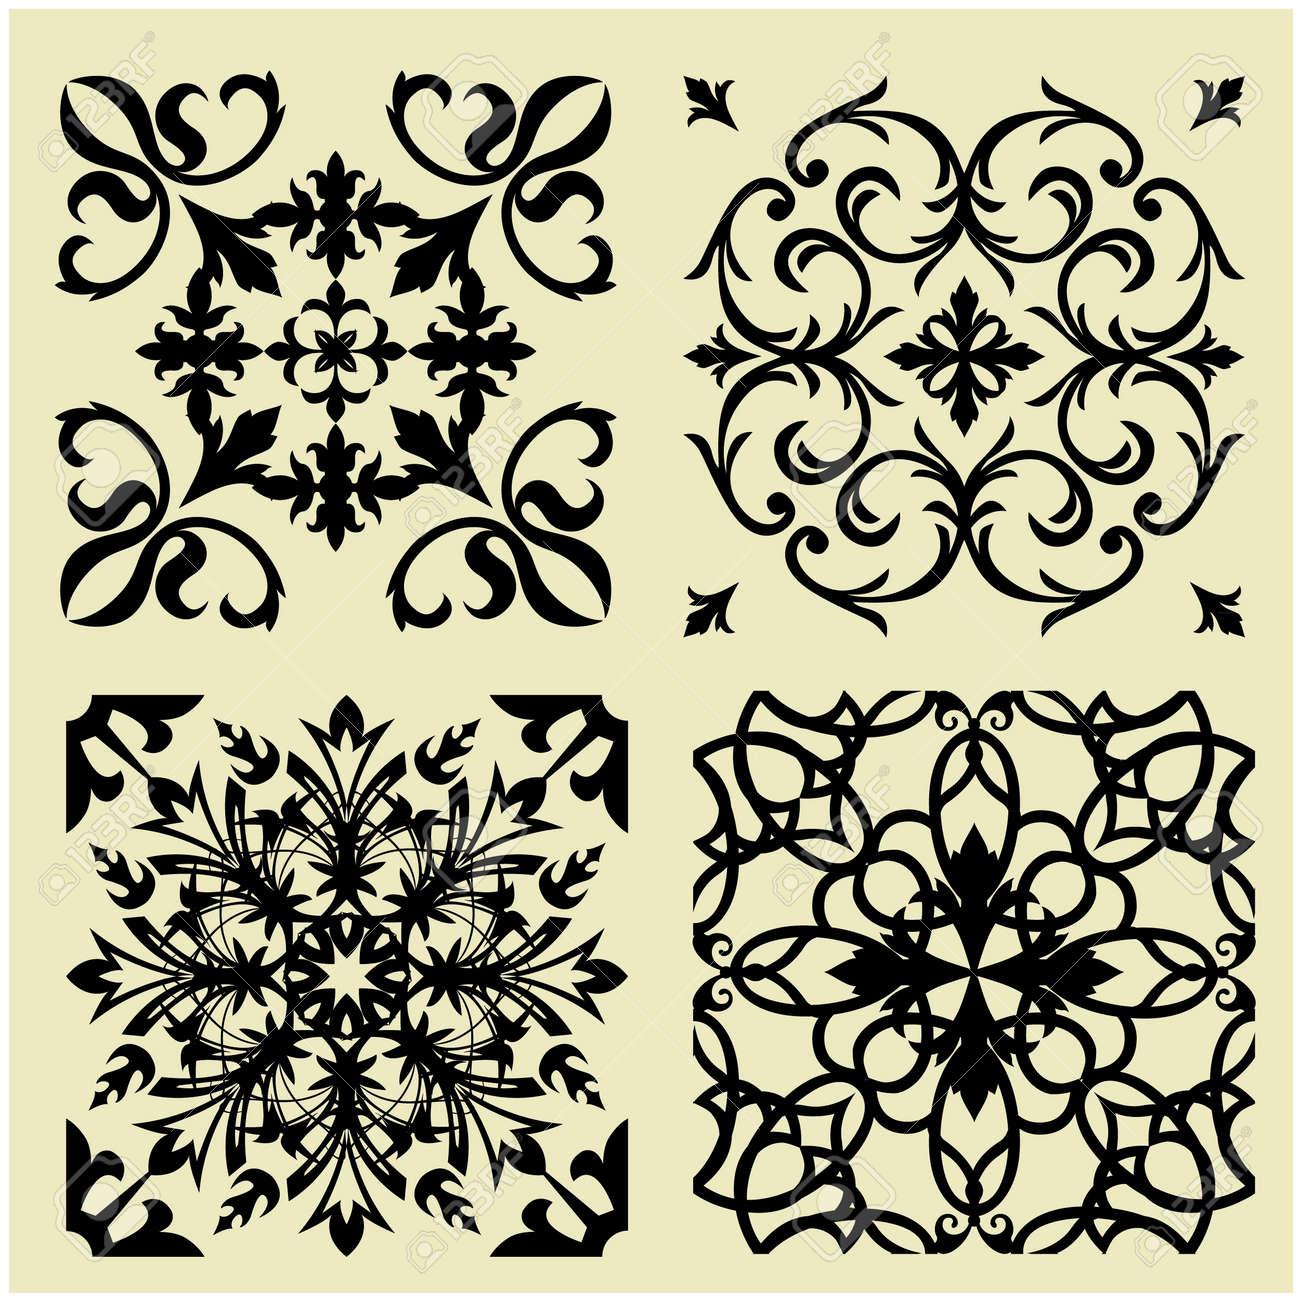 art vintage pattern background Stock Photo - 13133207